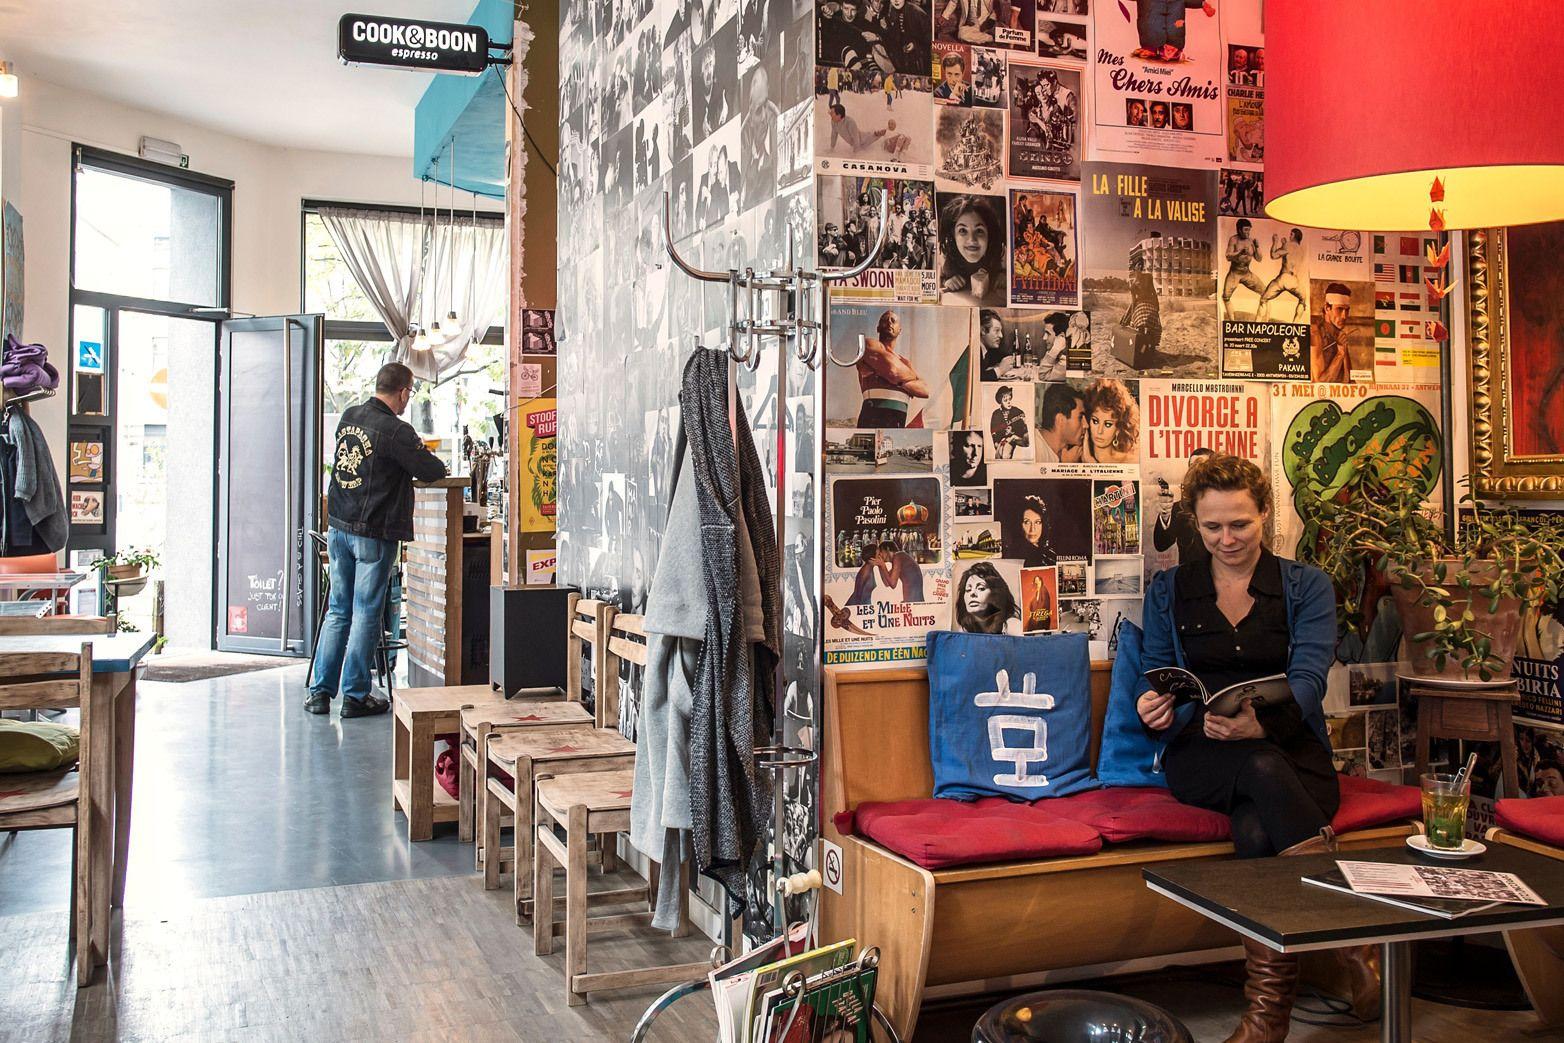 Cafe Antwerp